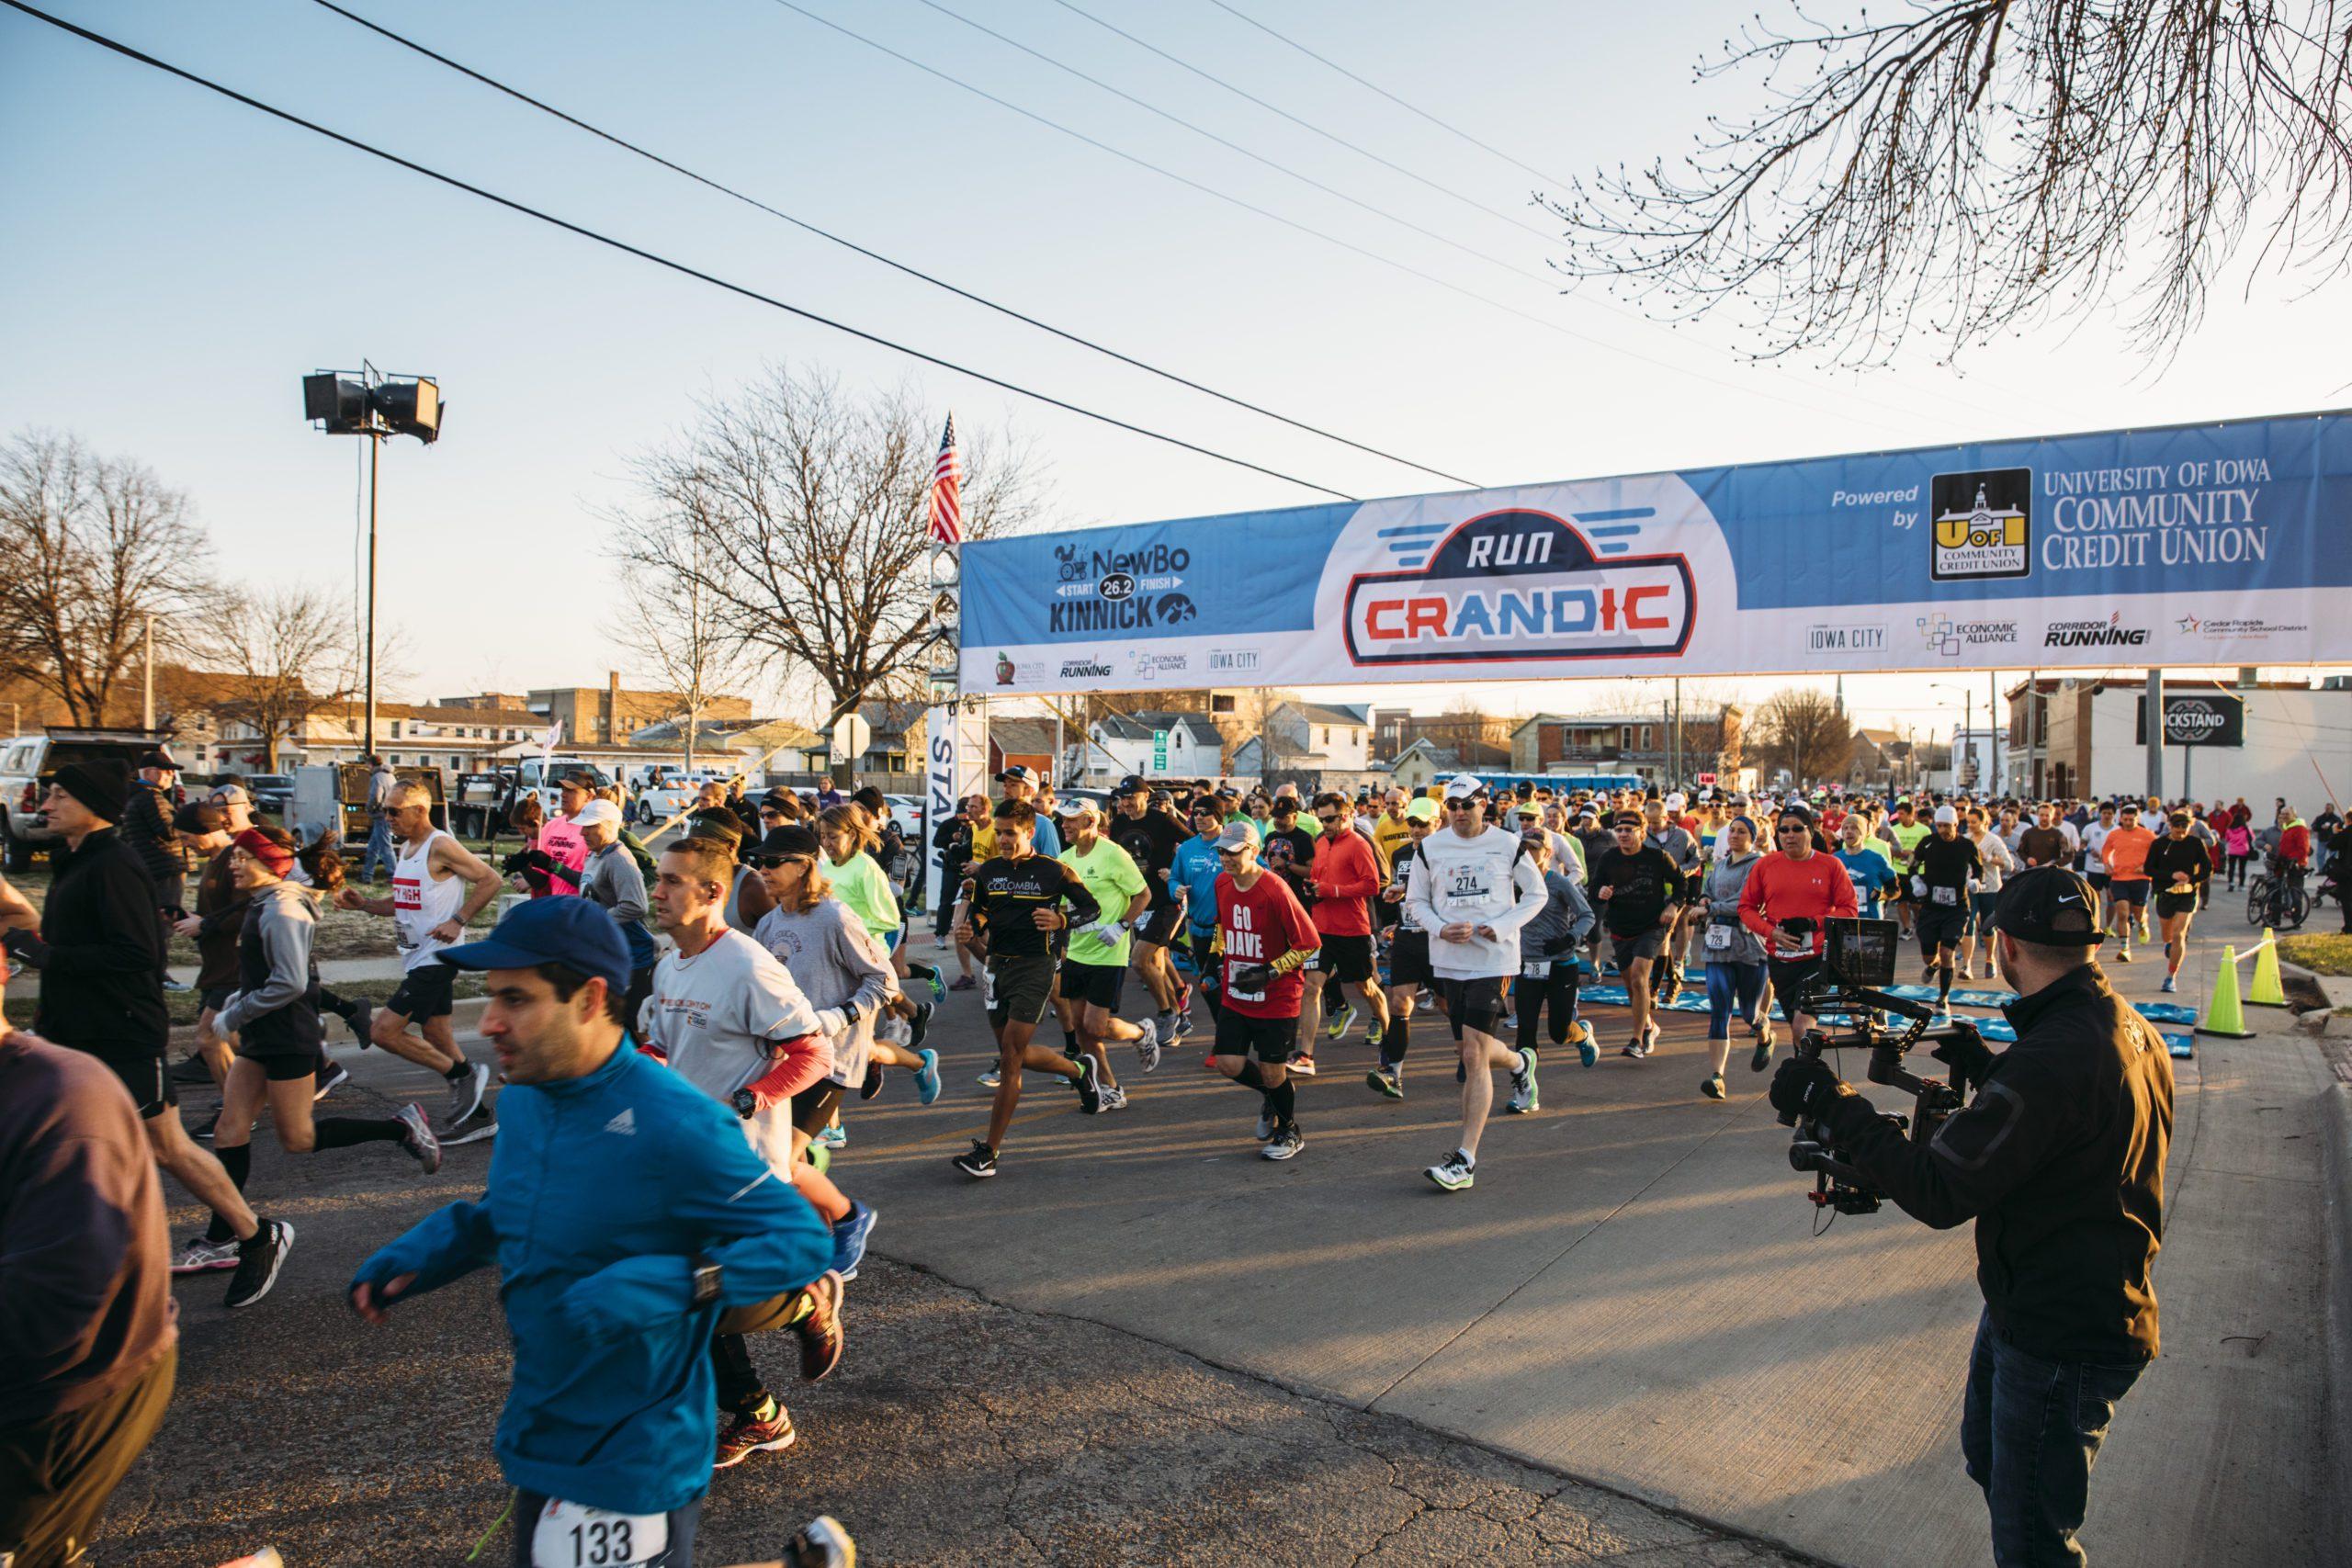 Run CRANDIC Race Participants Starting their race.